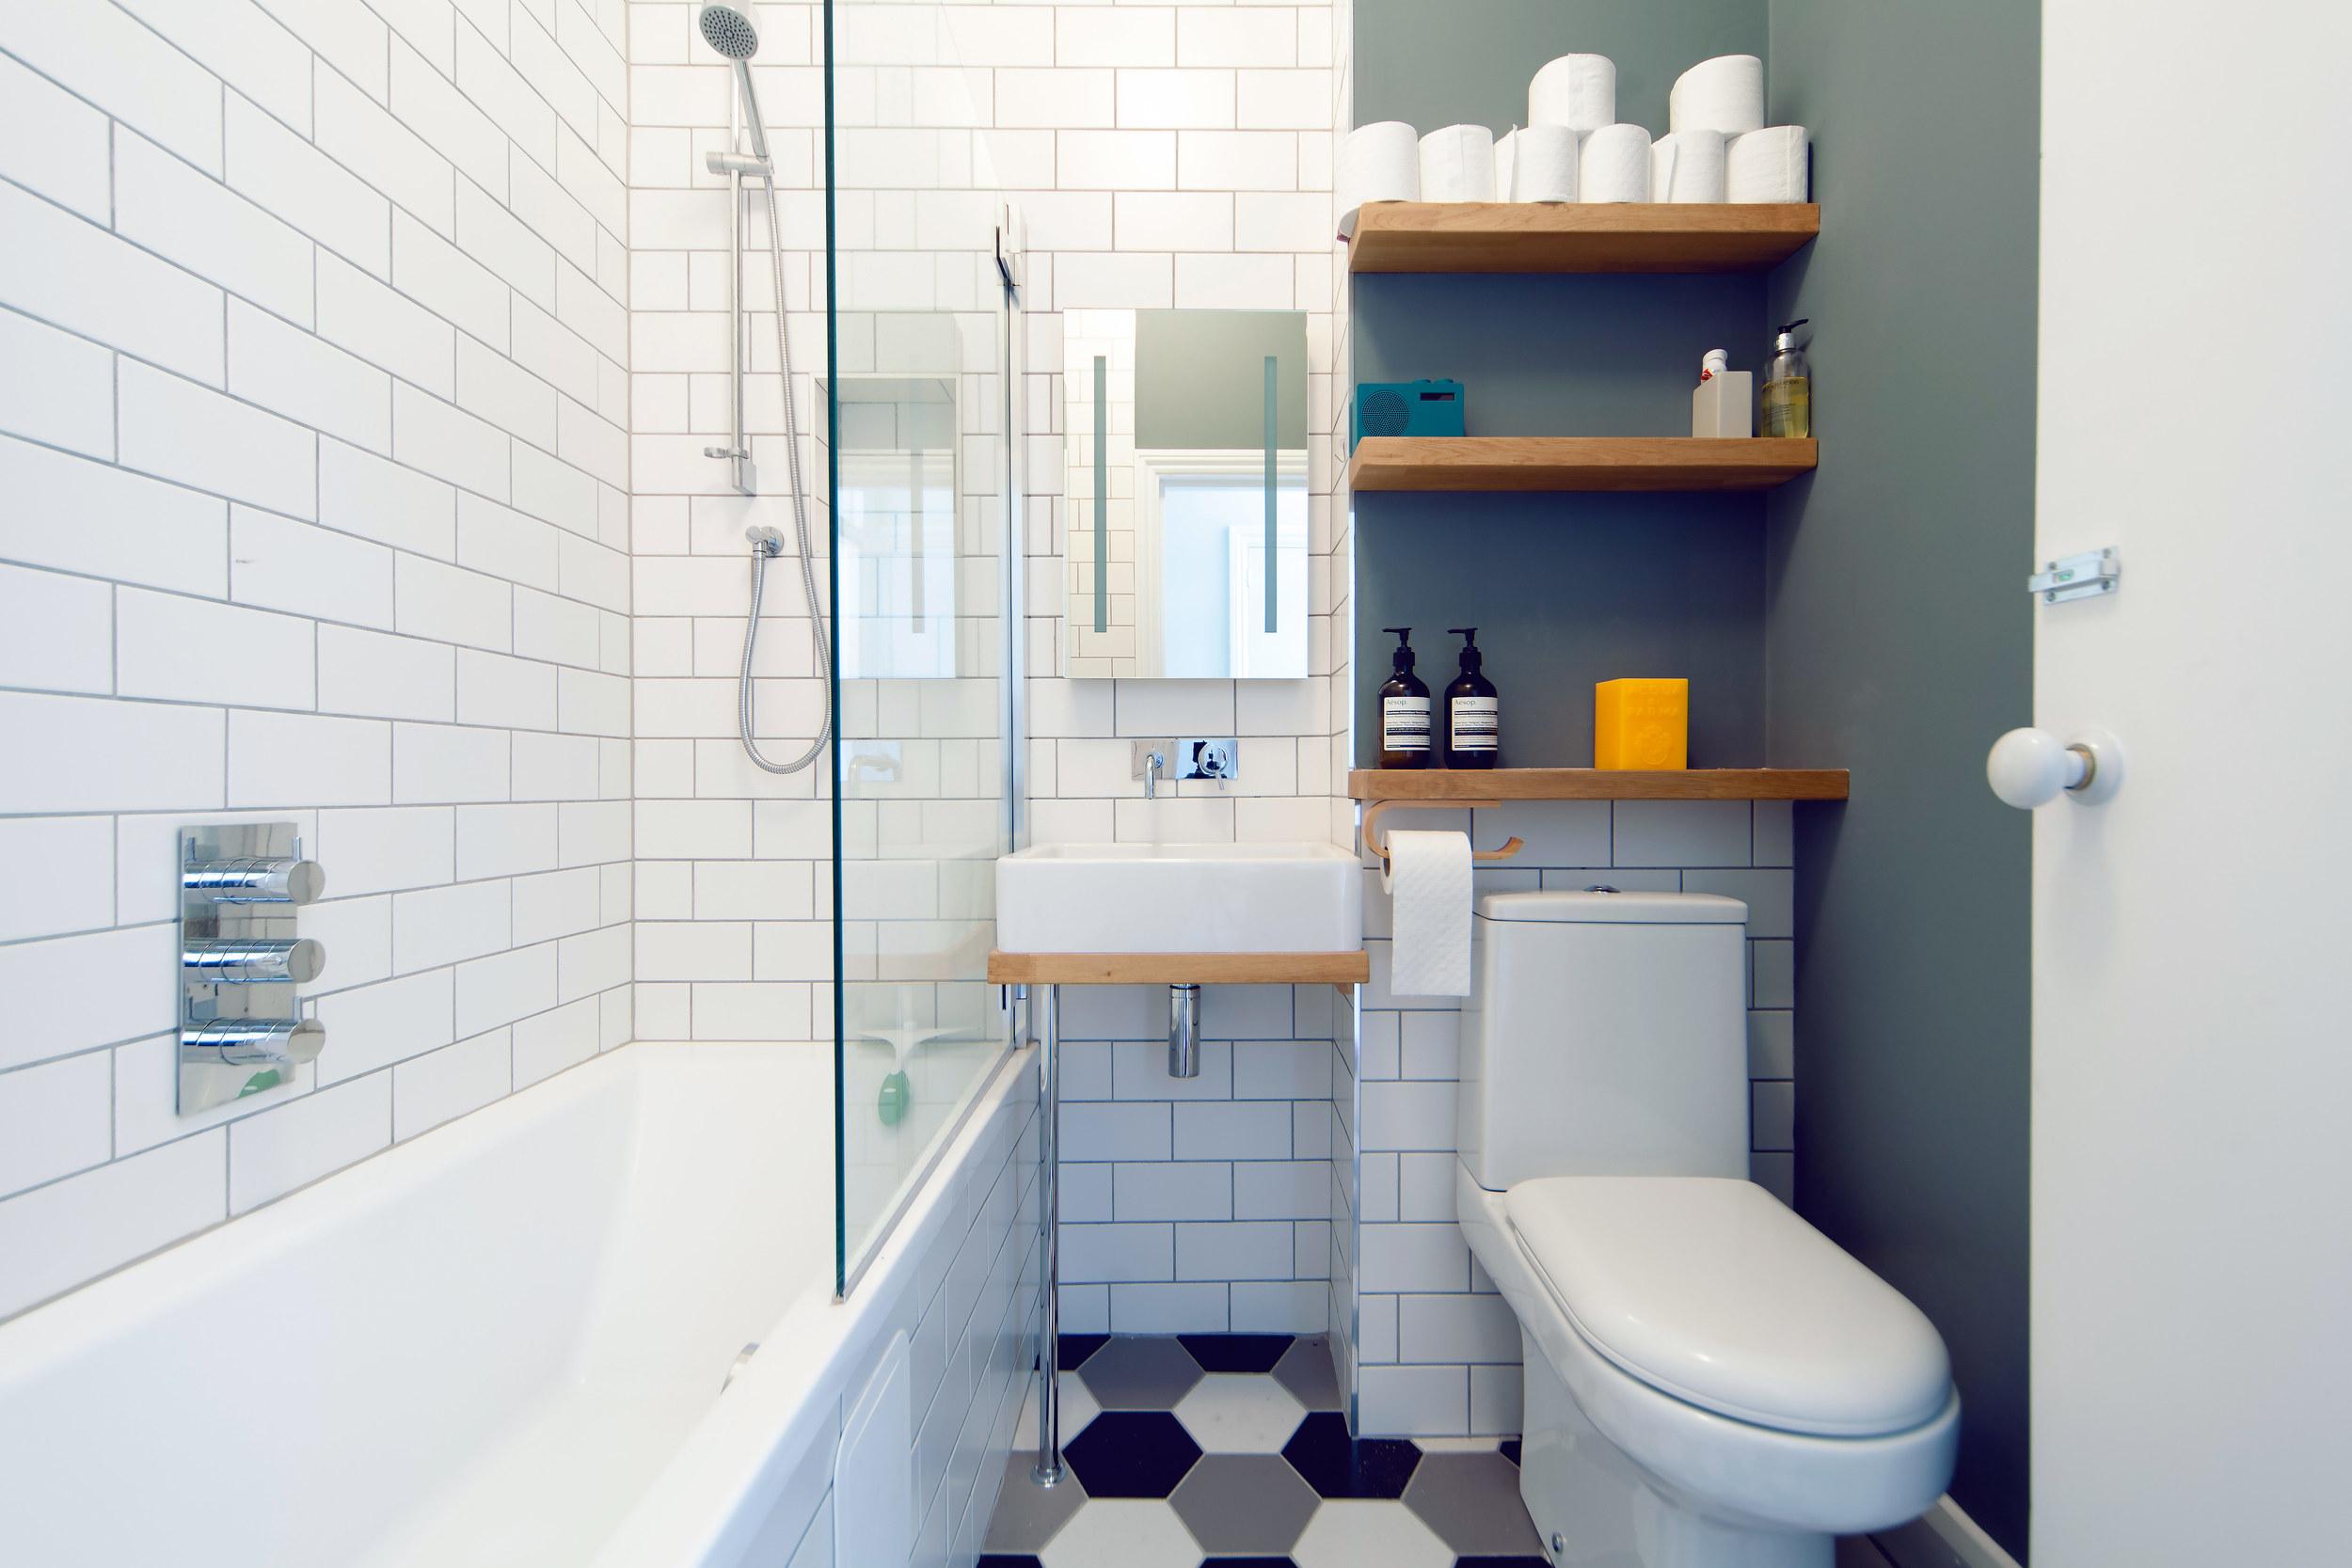 lesleybathroom.jpg